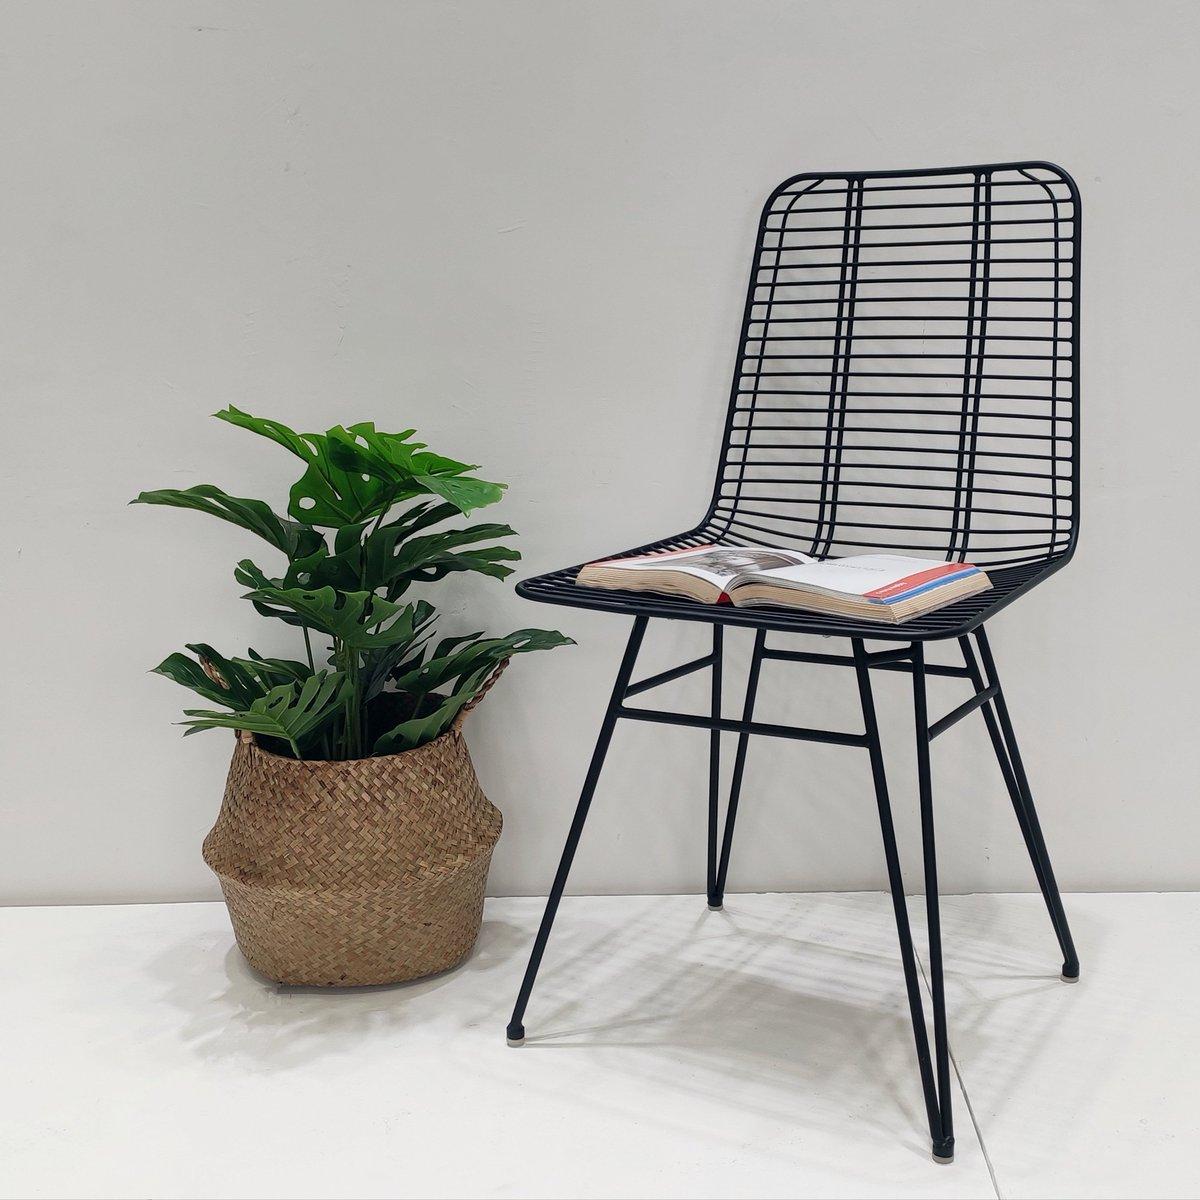 home and garden use.  #furniture #project #businesspic.twitter.com/u1dIIOyFuw